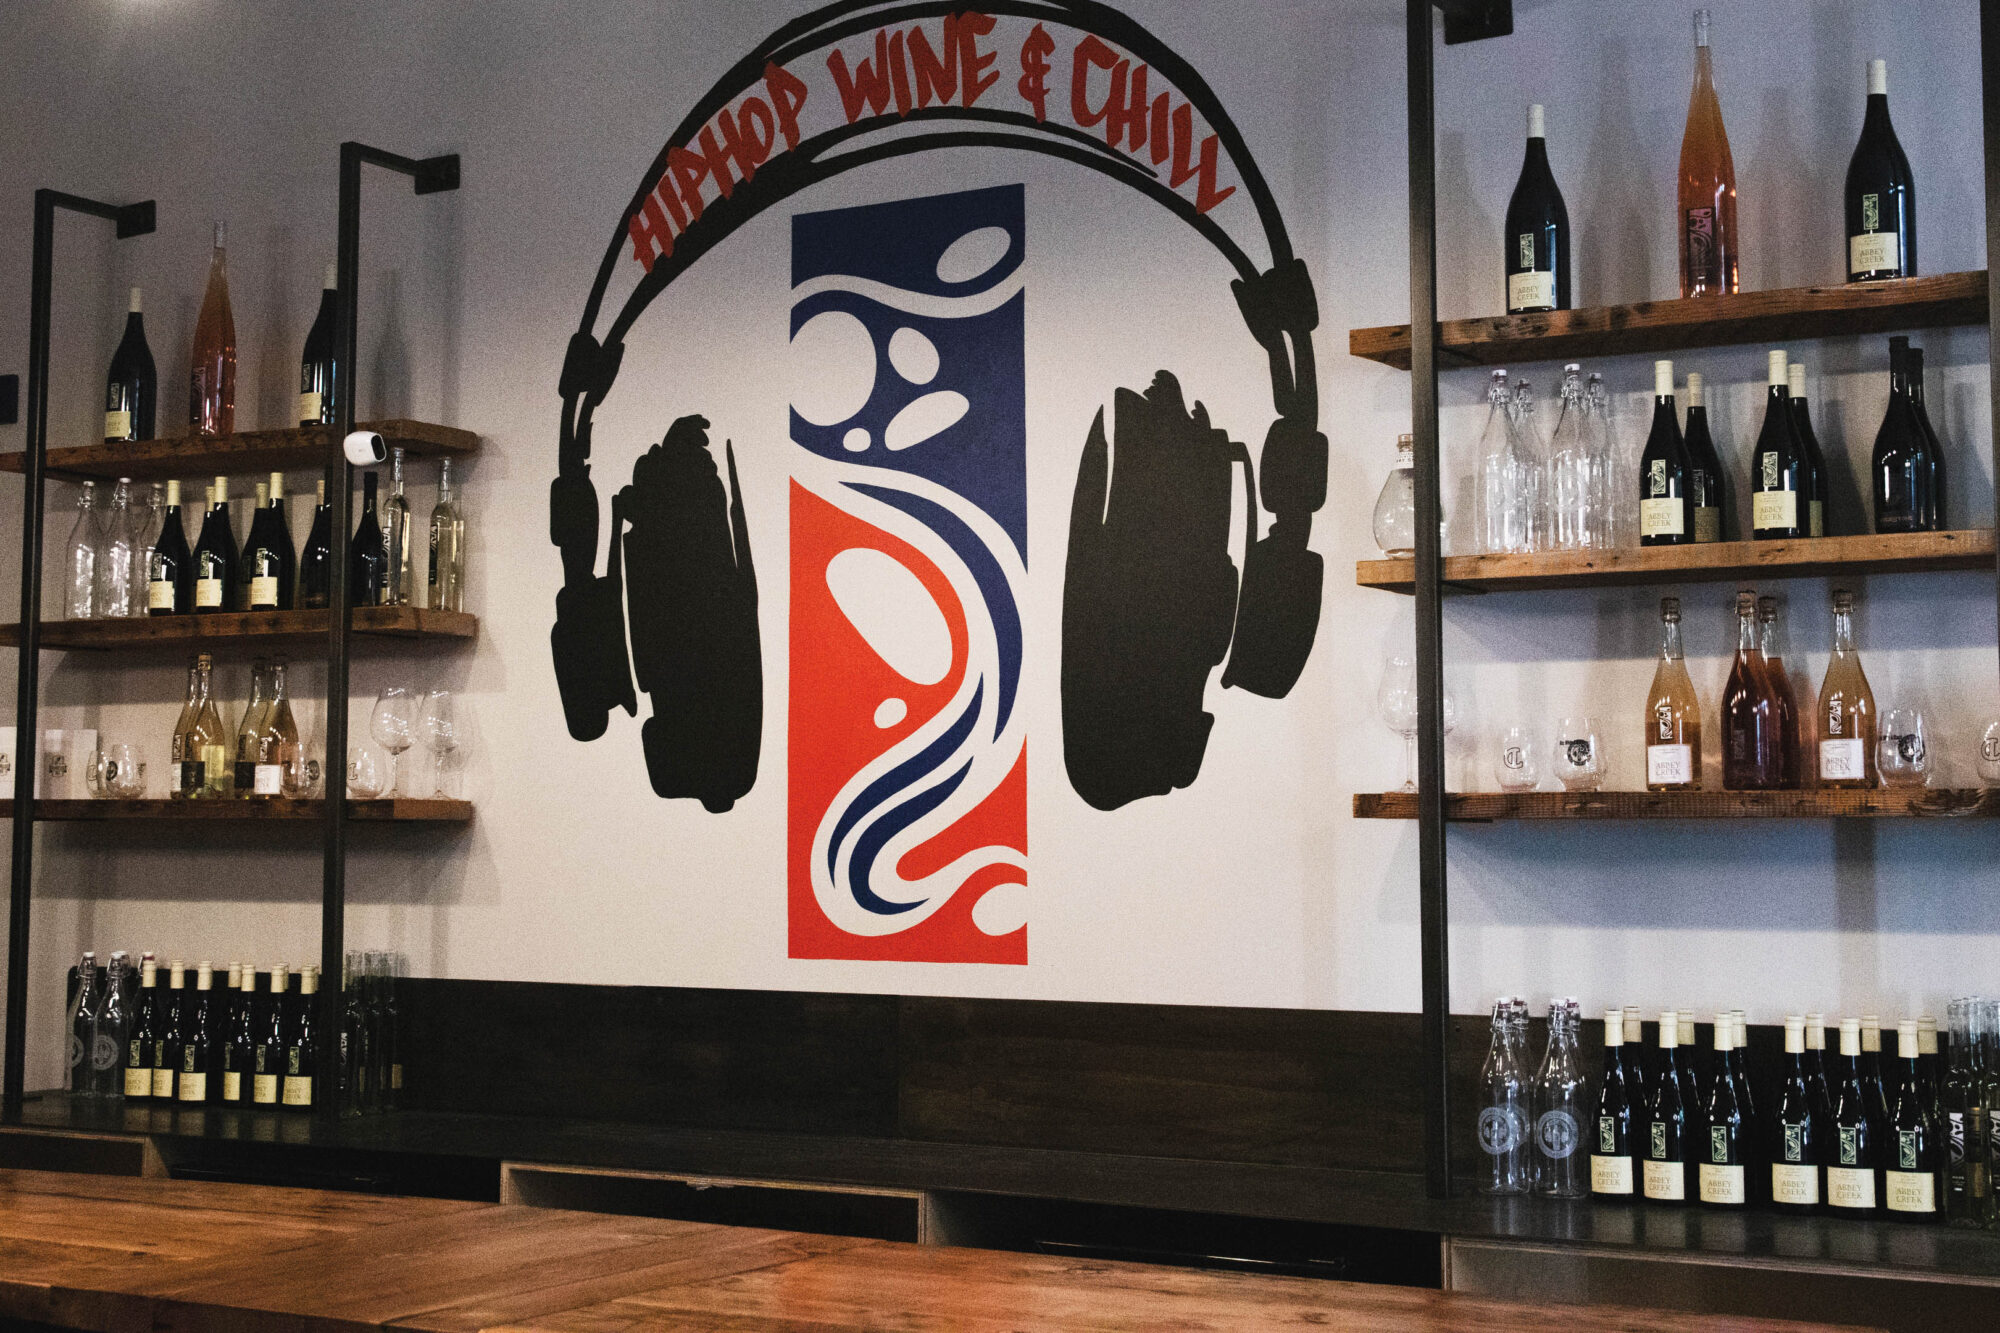 Headphone wall art in a wine shop